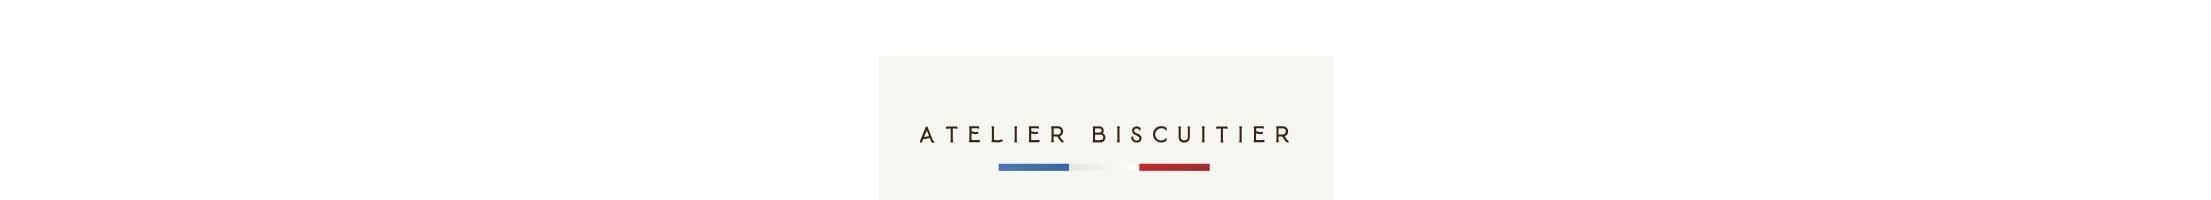 Logo Bandeau Intercalaire Biscuitier